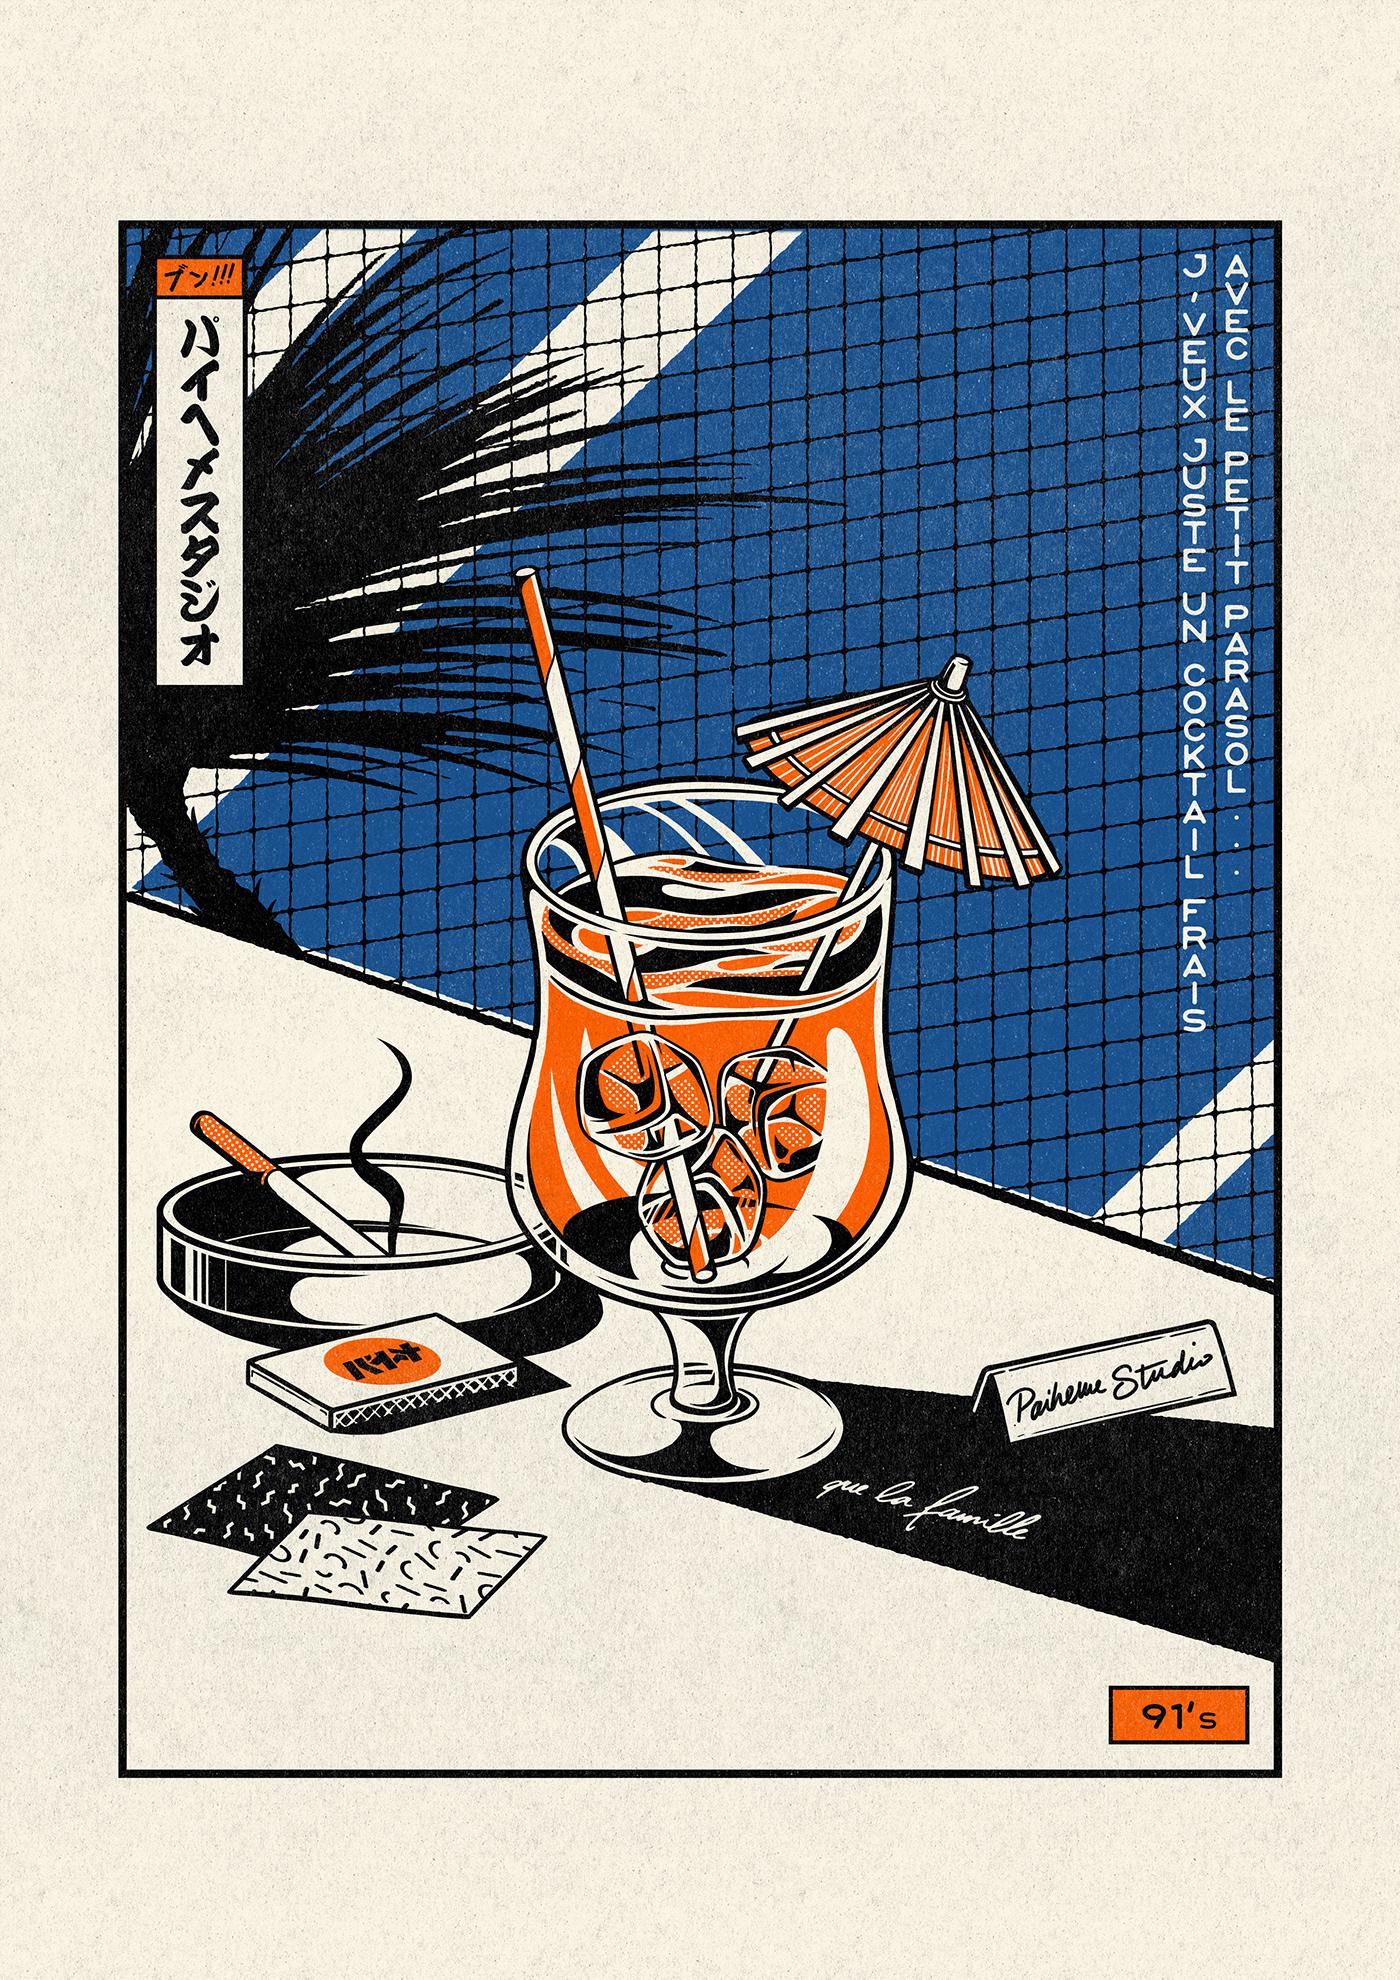 paiheme Japaneseprint japanese vintage Retro japanesegraphism typography   paihemestudio rap